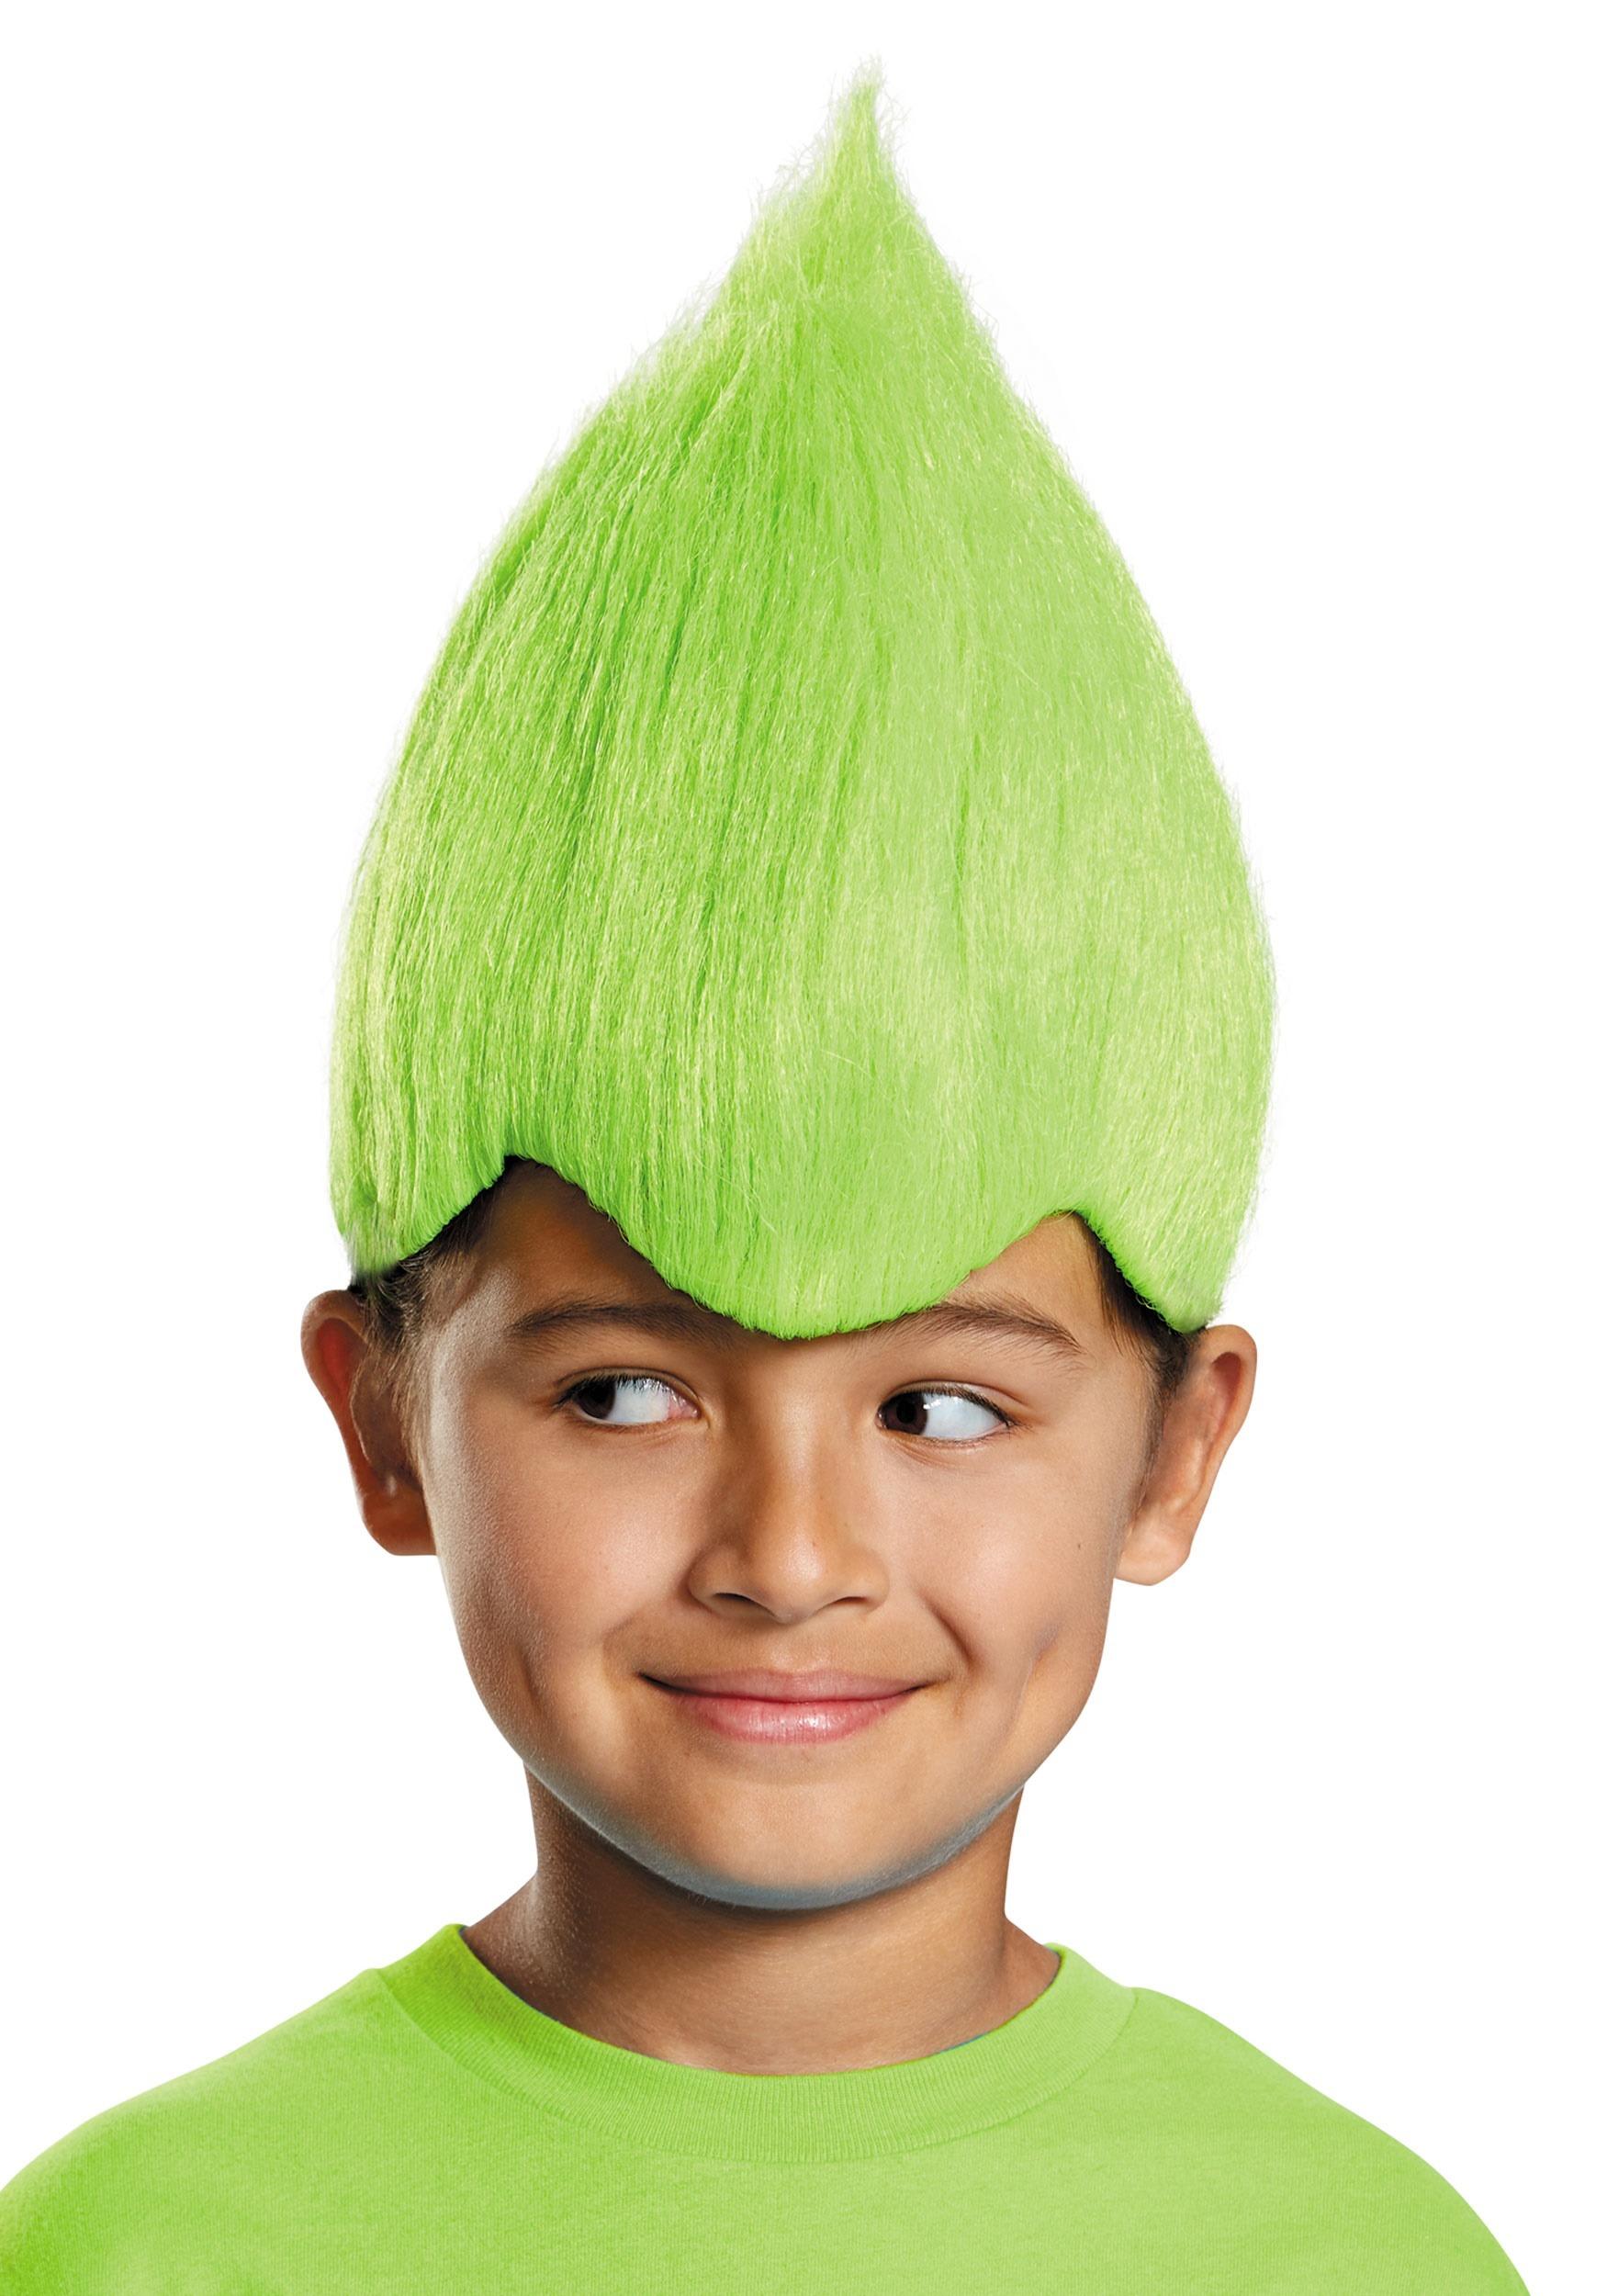 Green Wacky Wig for Kids 662b1b5665d5